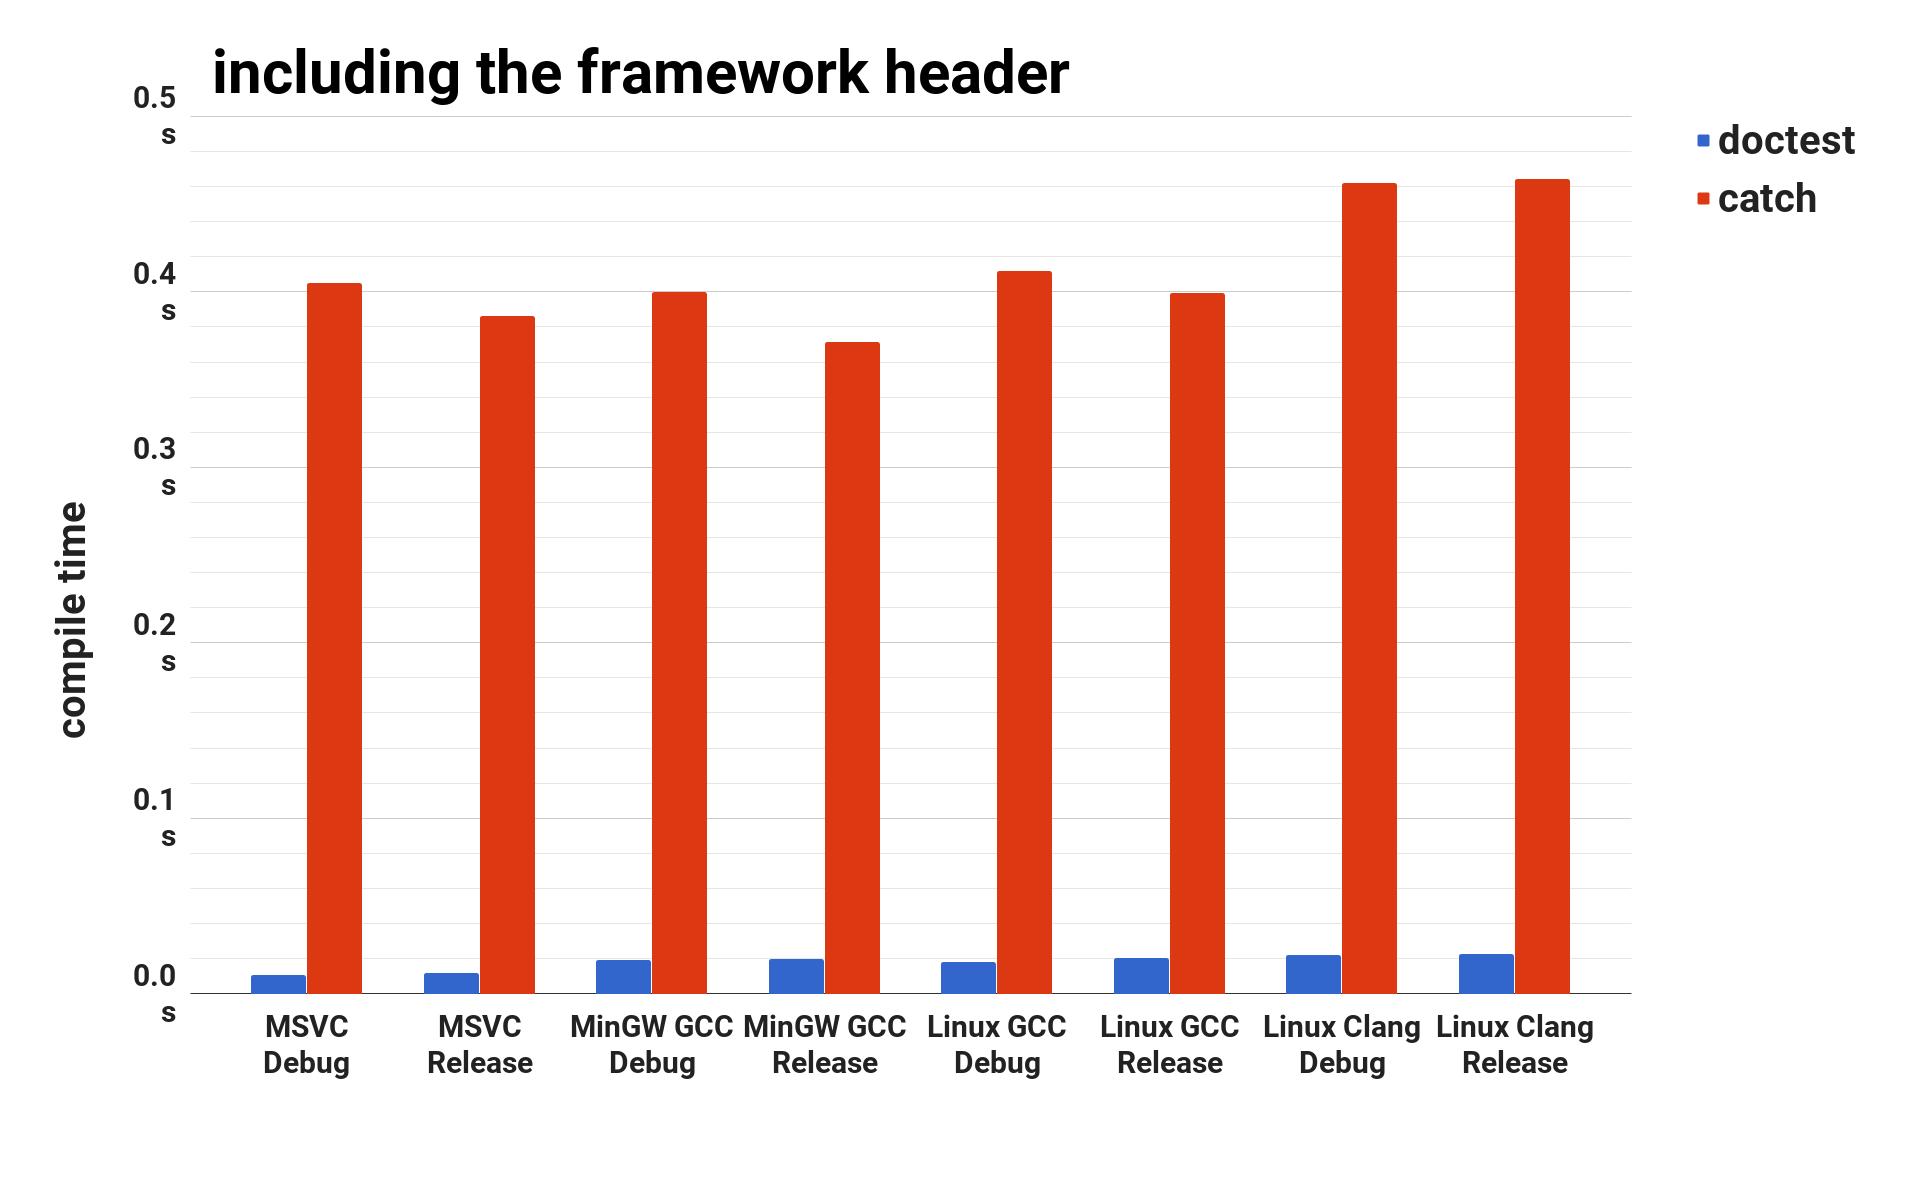 cost-of-including-the-framework-header